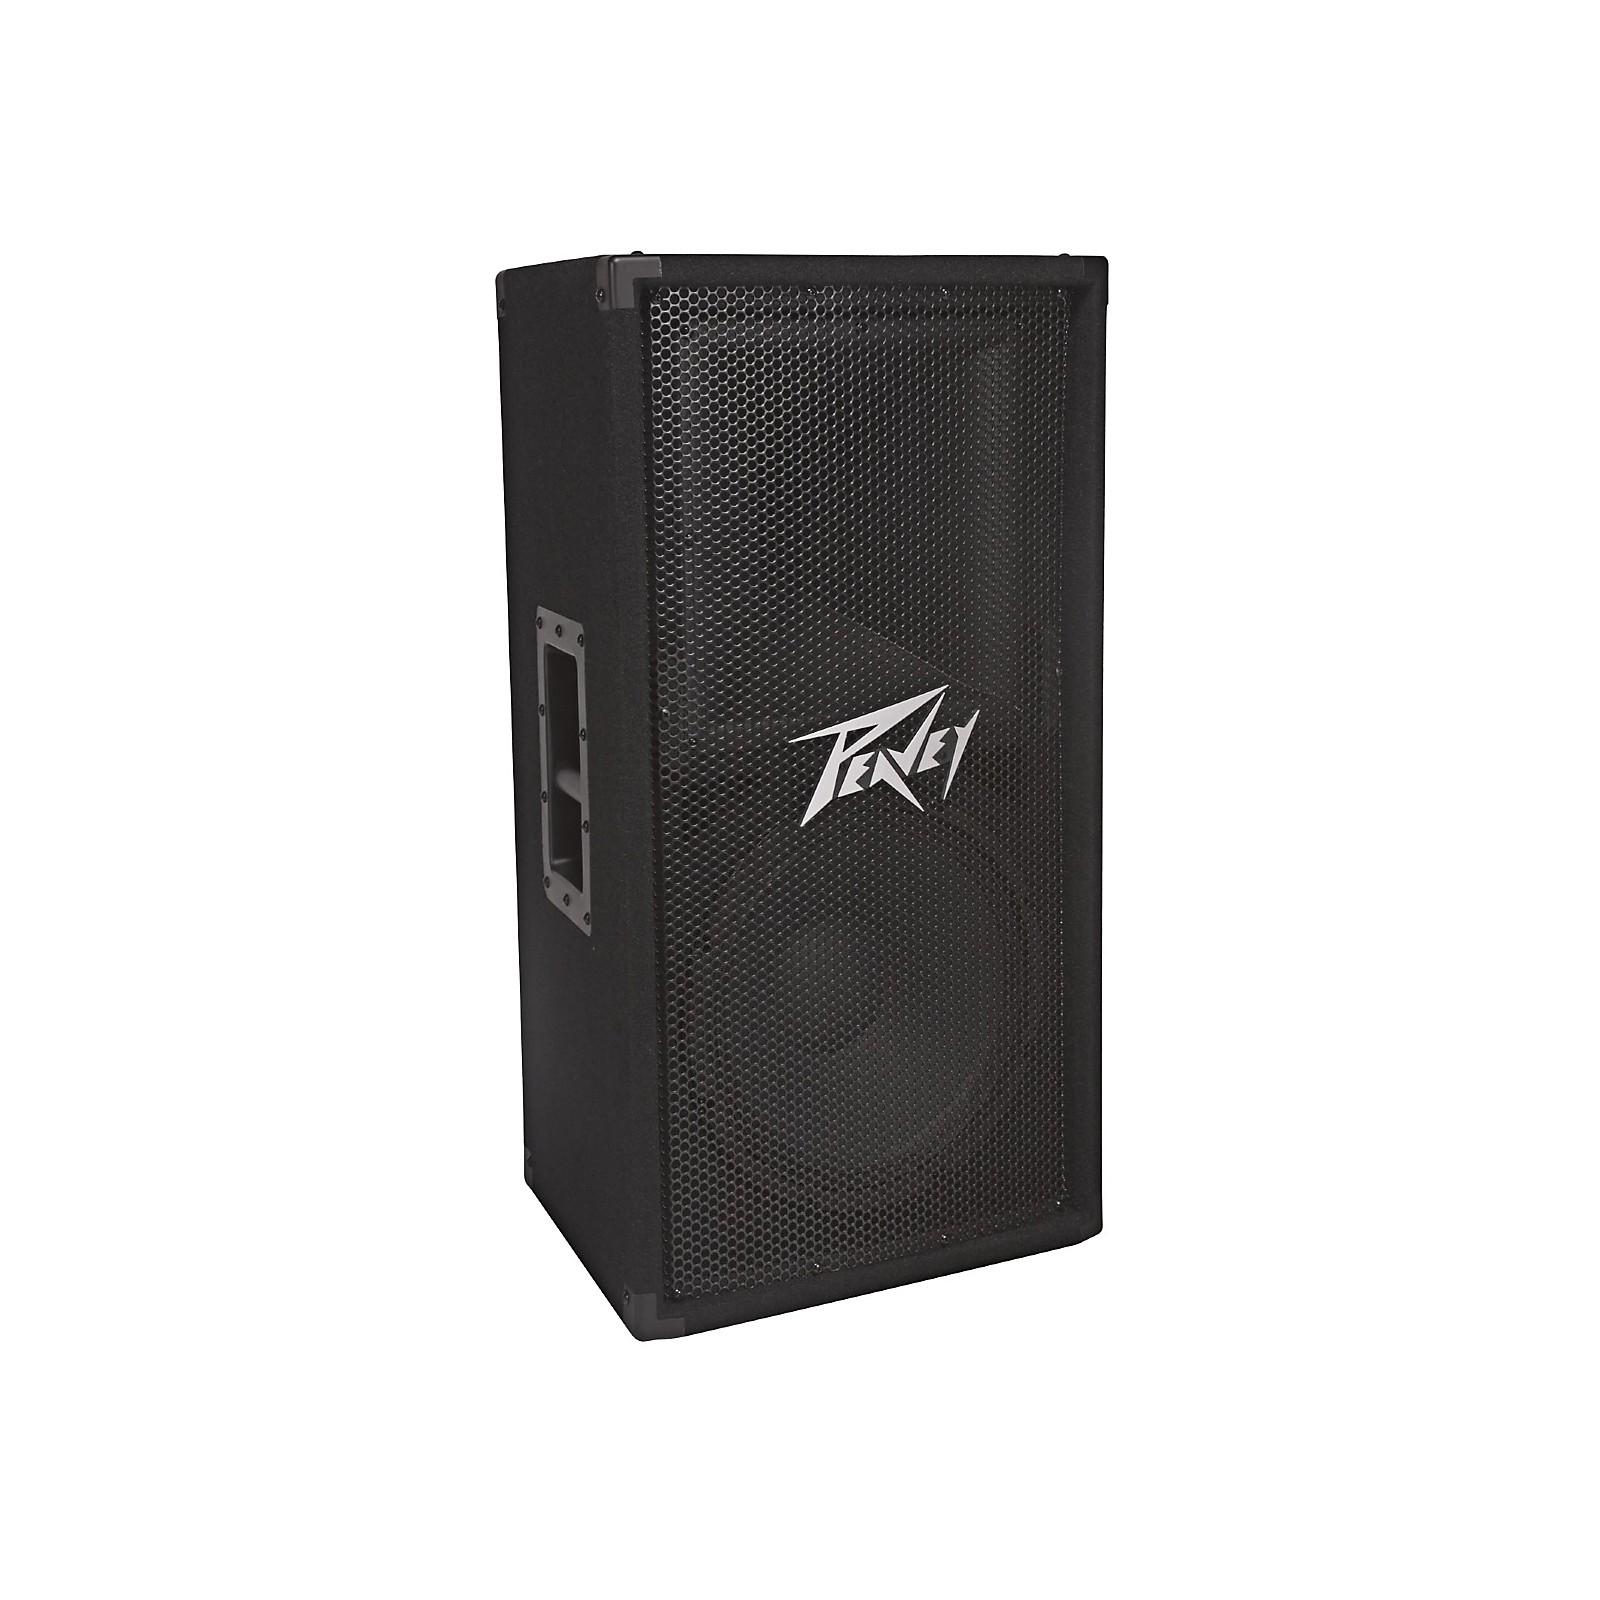 Peavey PV 112 Two-Way Speaker System